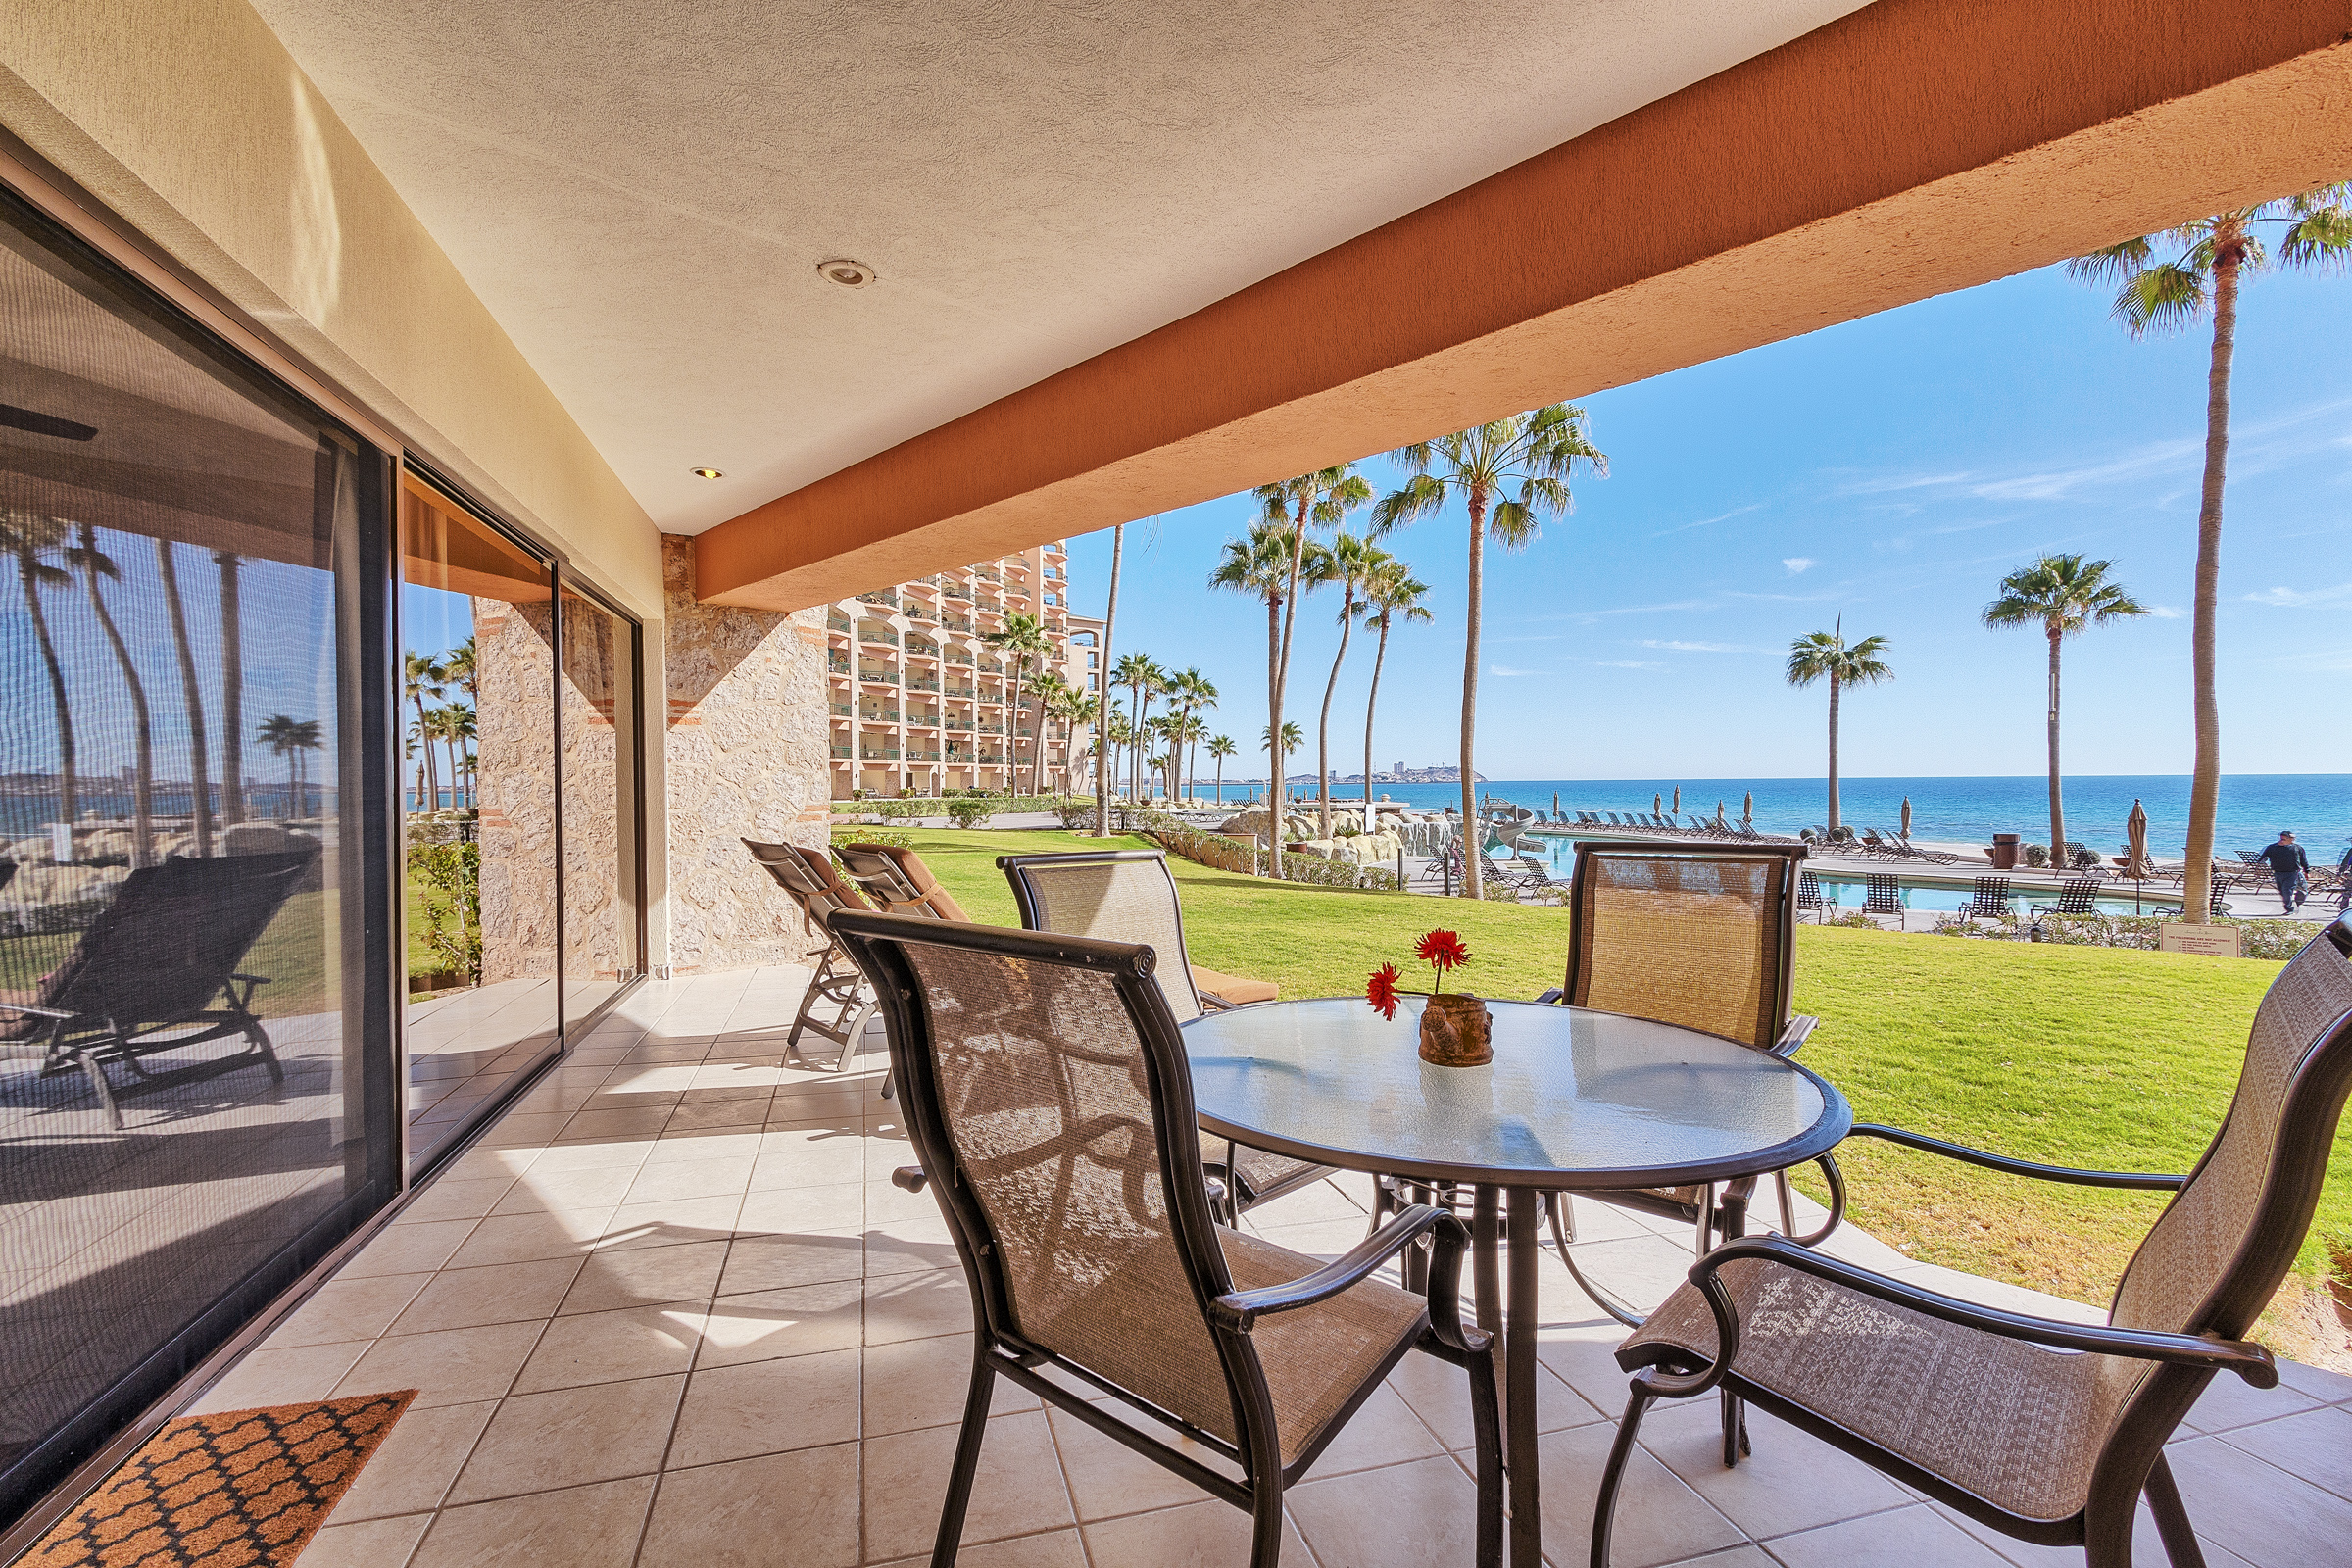 The Sonoran Sea Resort